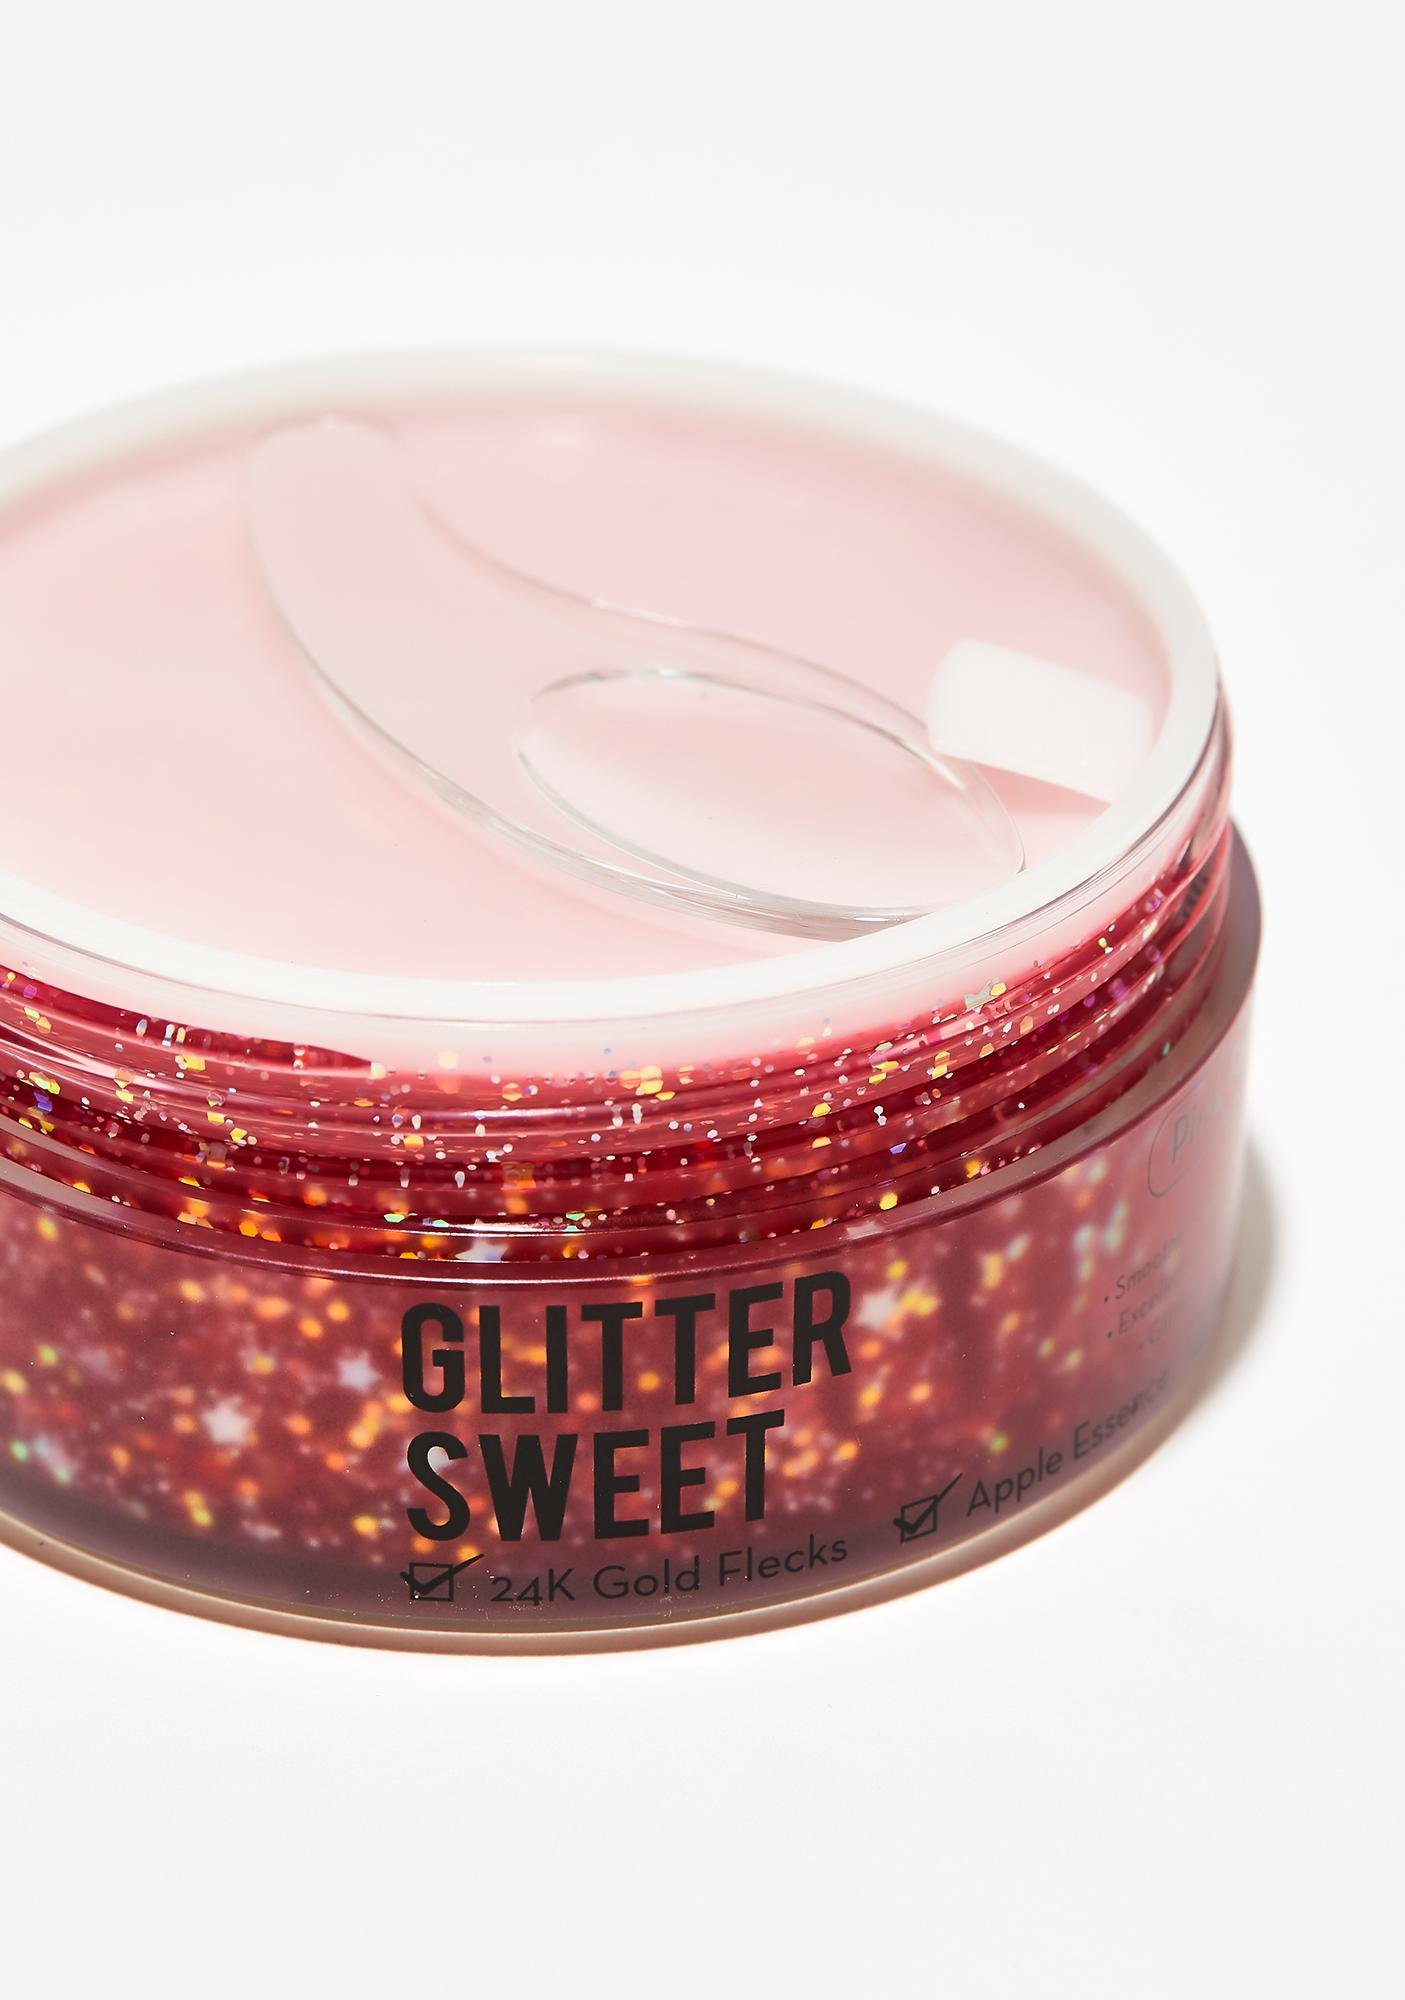 The Crème Shop Pretty Illuminating Glitter Sweet Mask